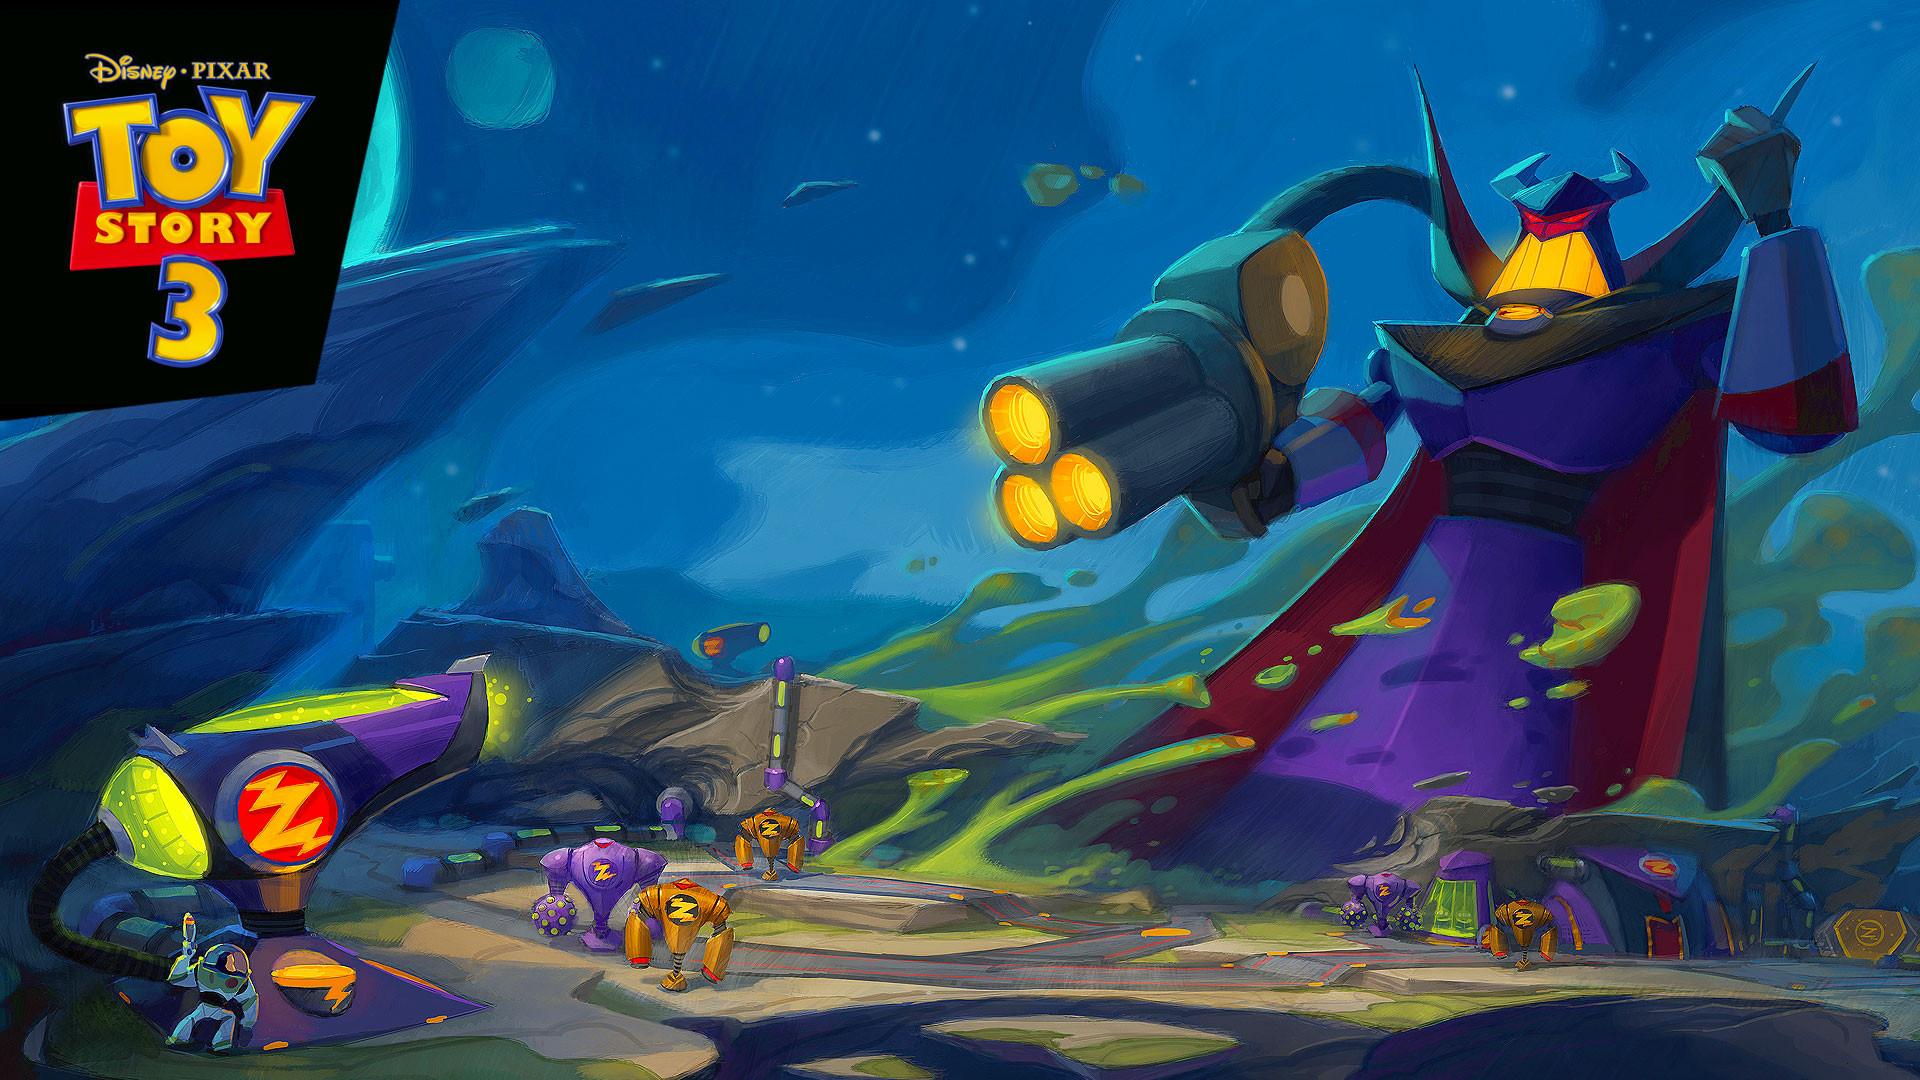 Toy_Story_3_Buzz_SP_Ben_Simonsen.jpg